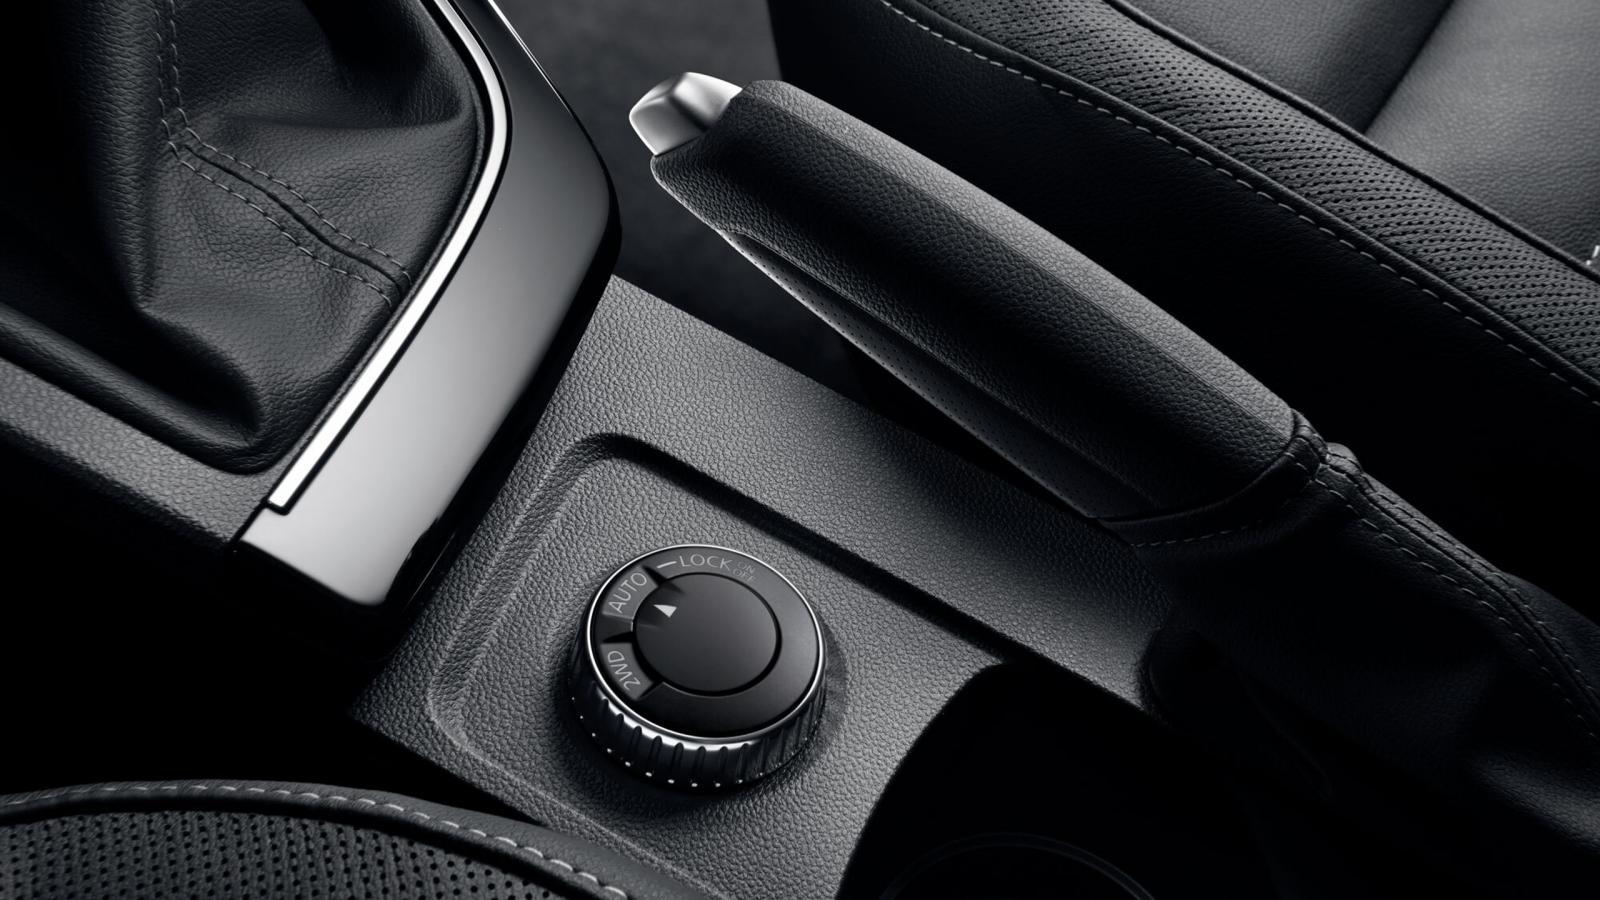 НОВИЙ Renault ARKANA  фото интерьера 3